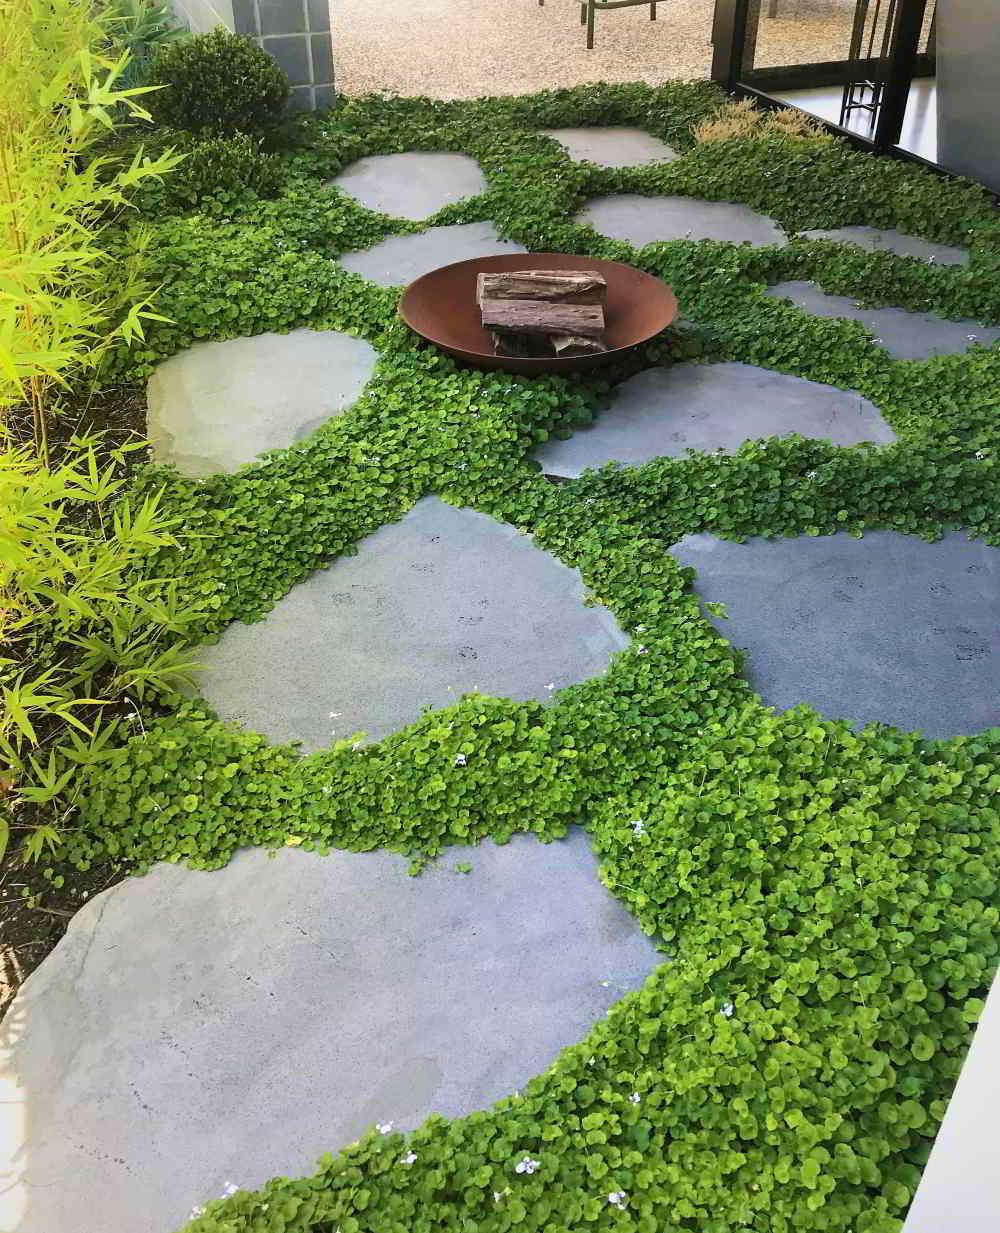 Landscaped stone paving